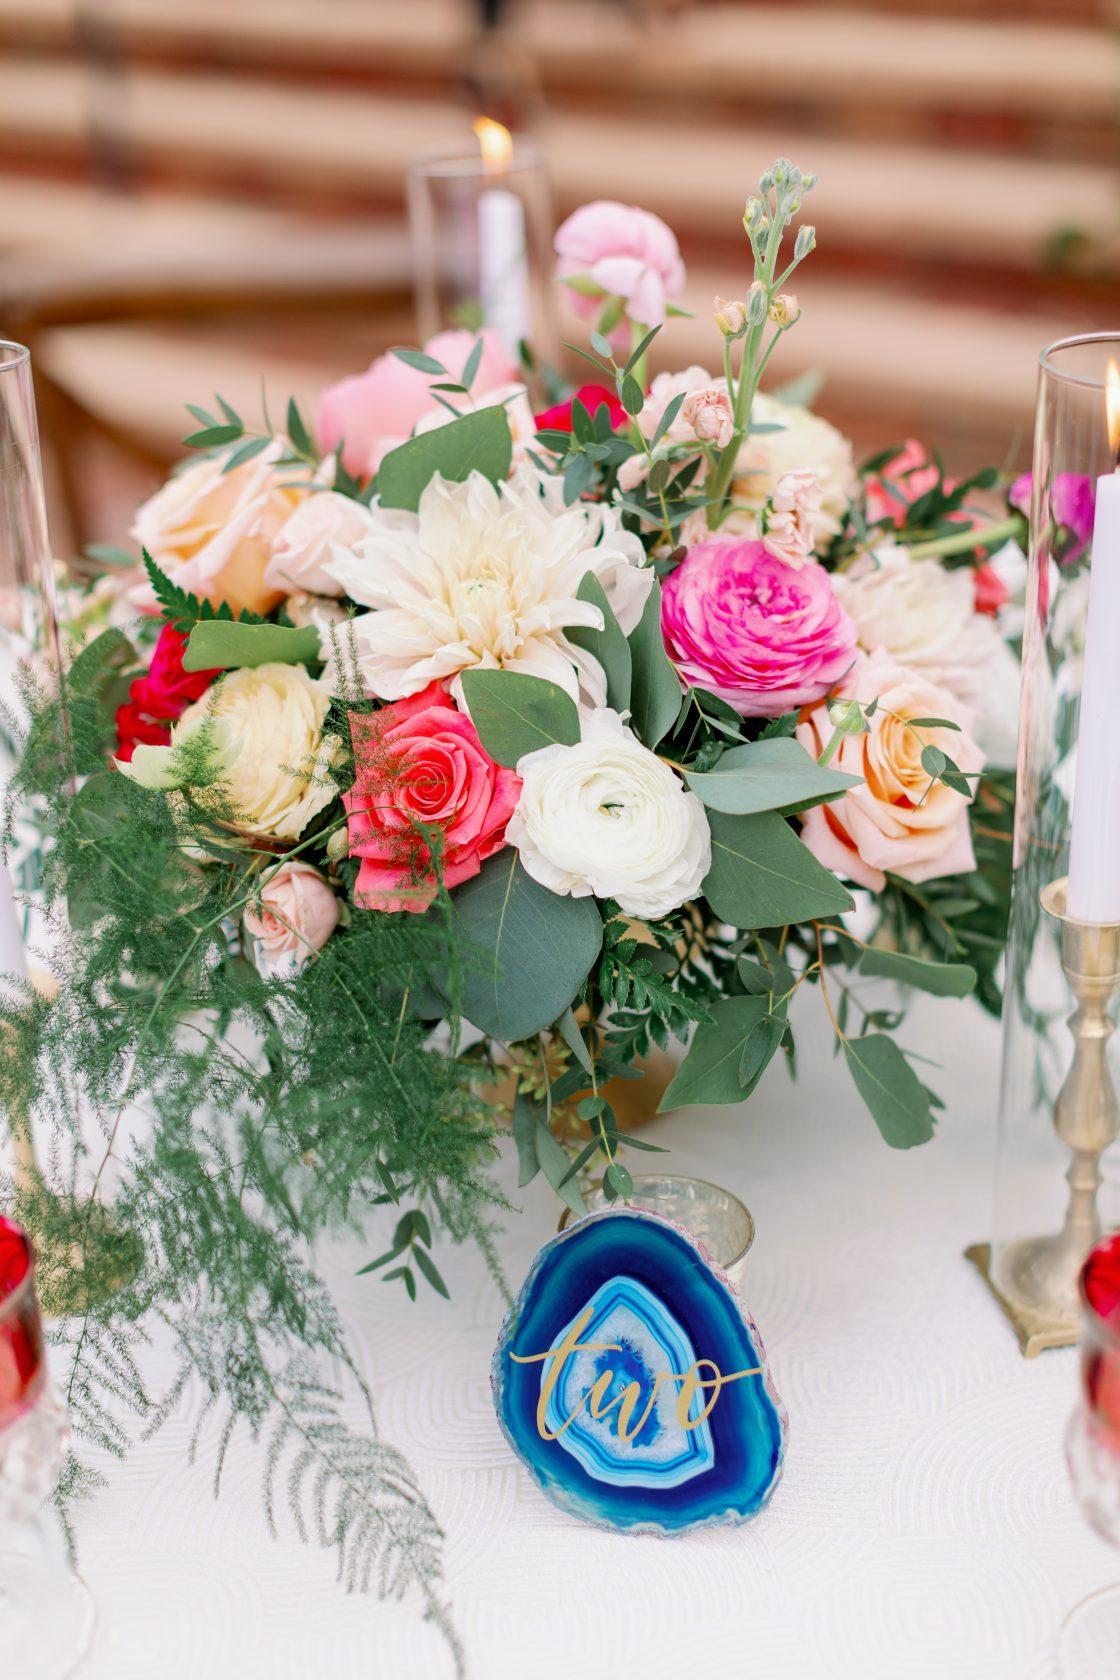 Blue Agate Slice Wedding Table Number